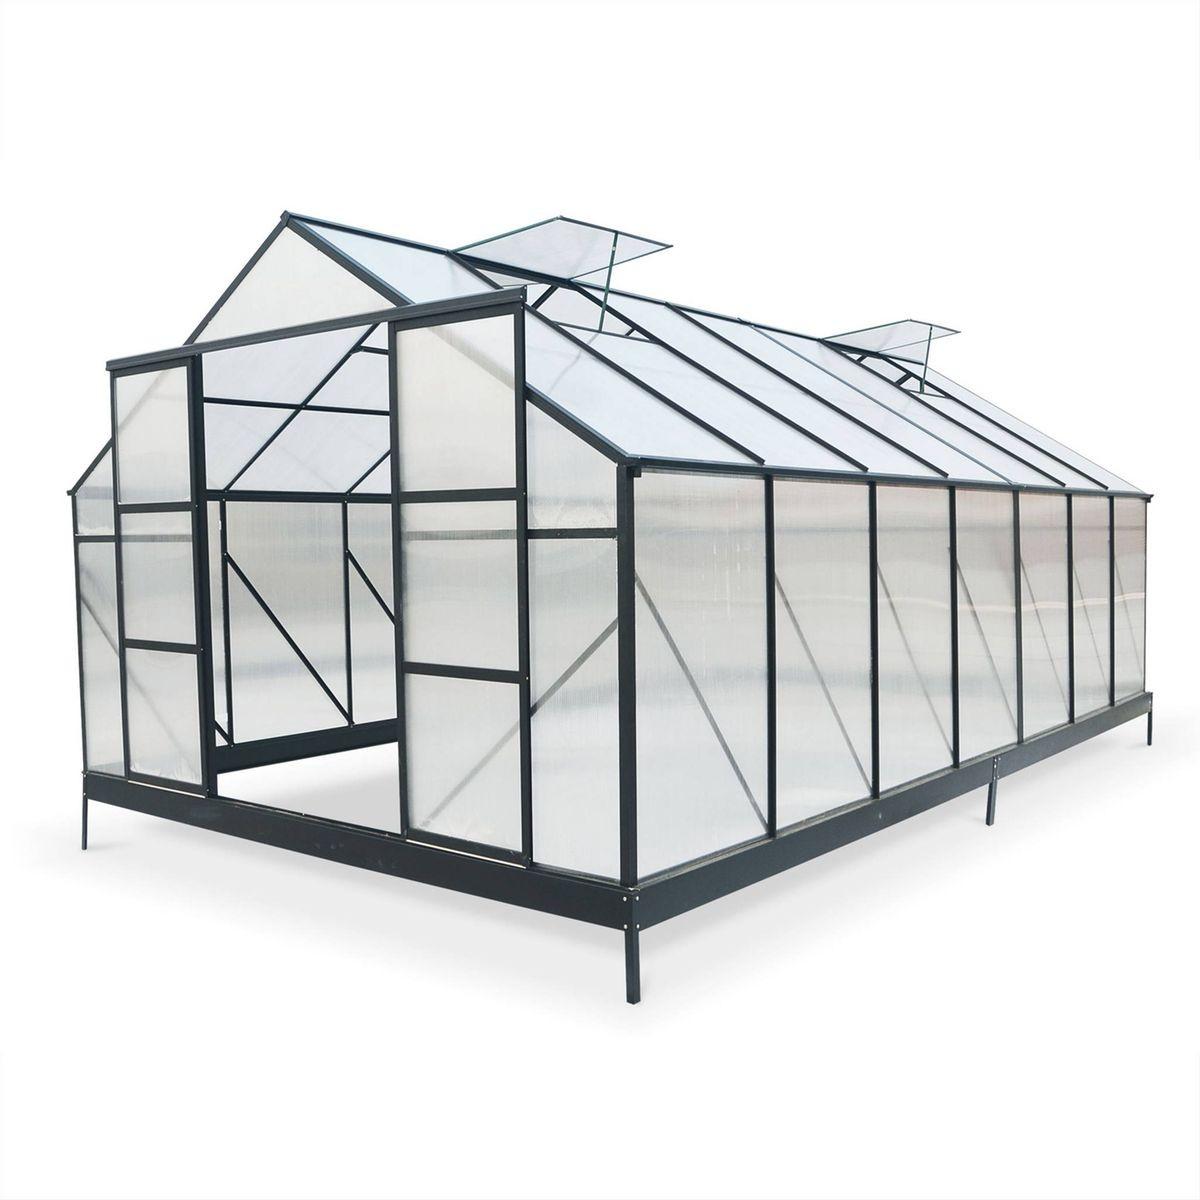 Grande serre de jardin PEUPLIER premium noire en polycarbonate 12m² ...